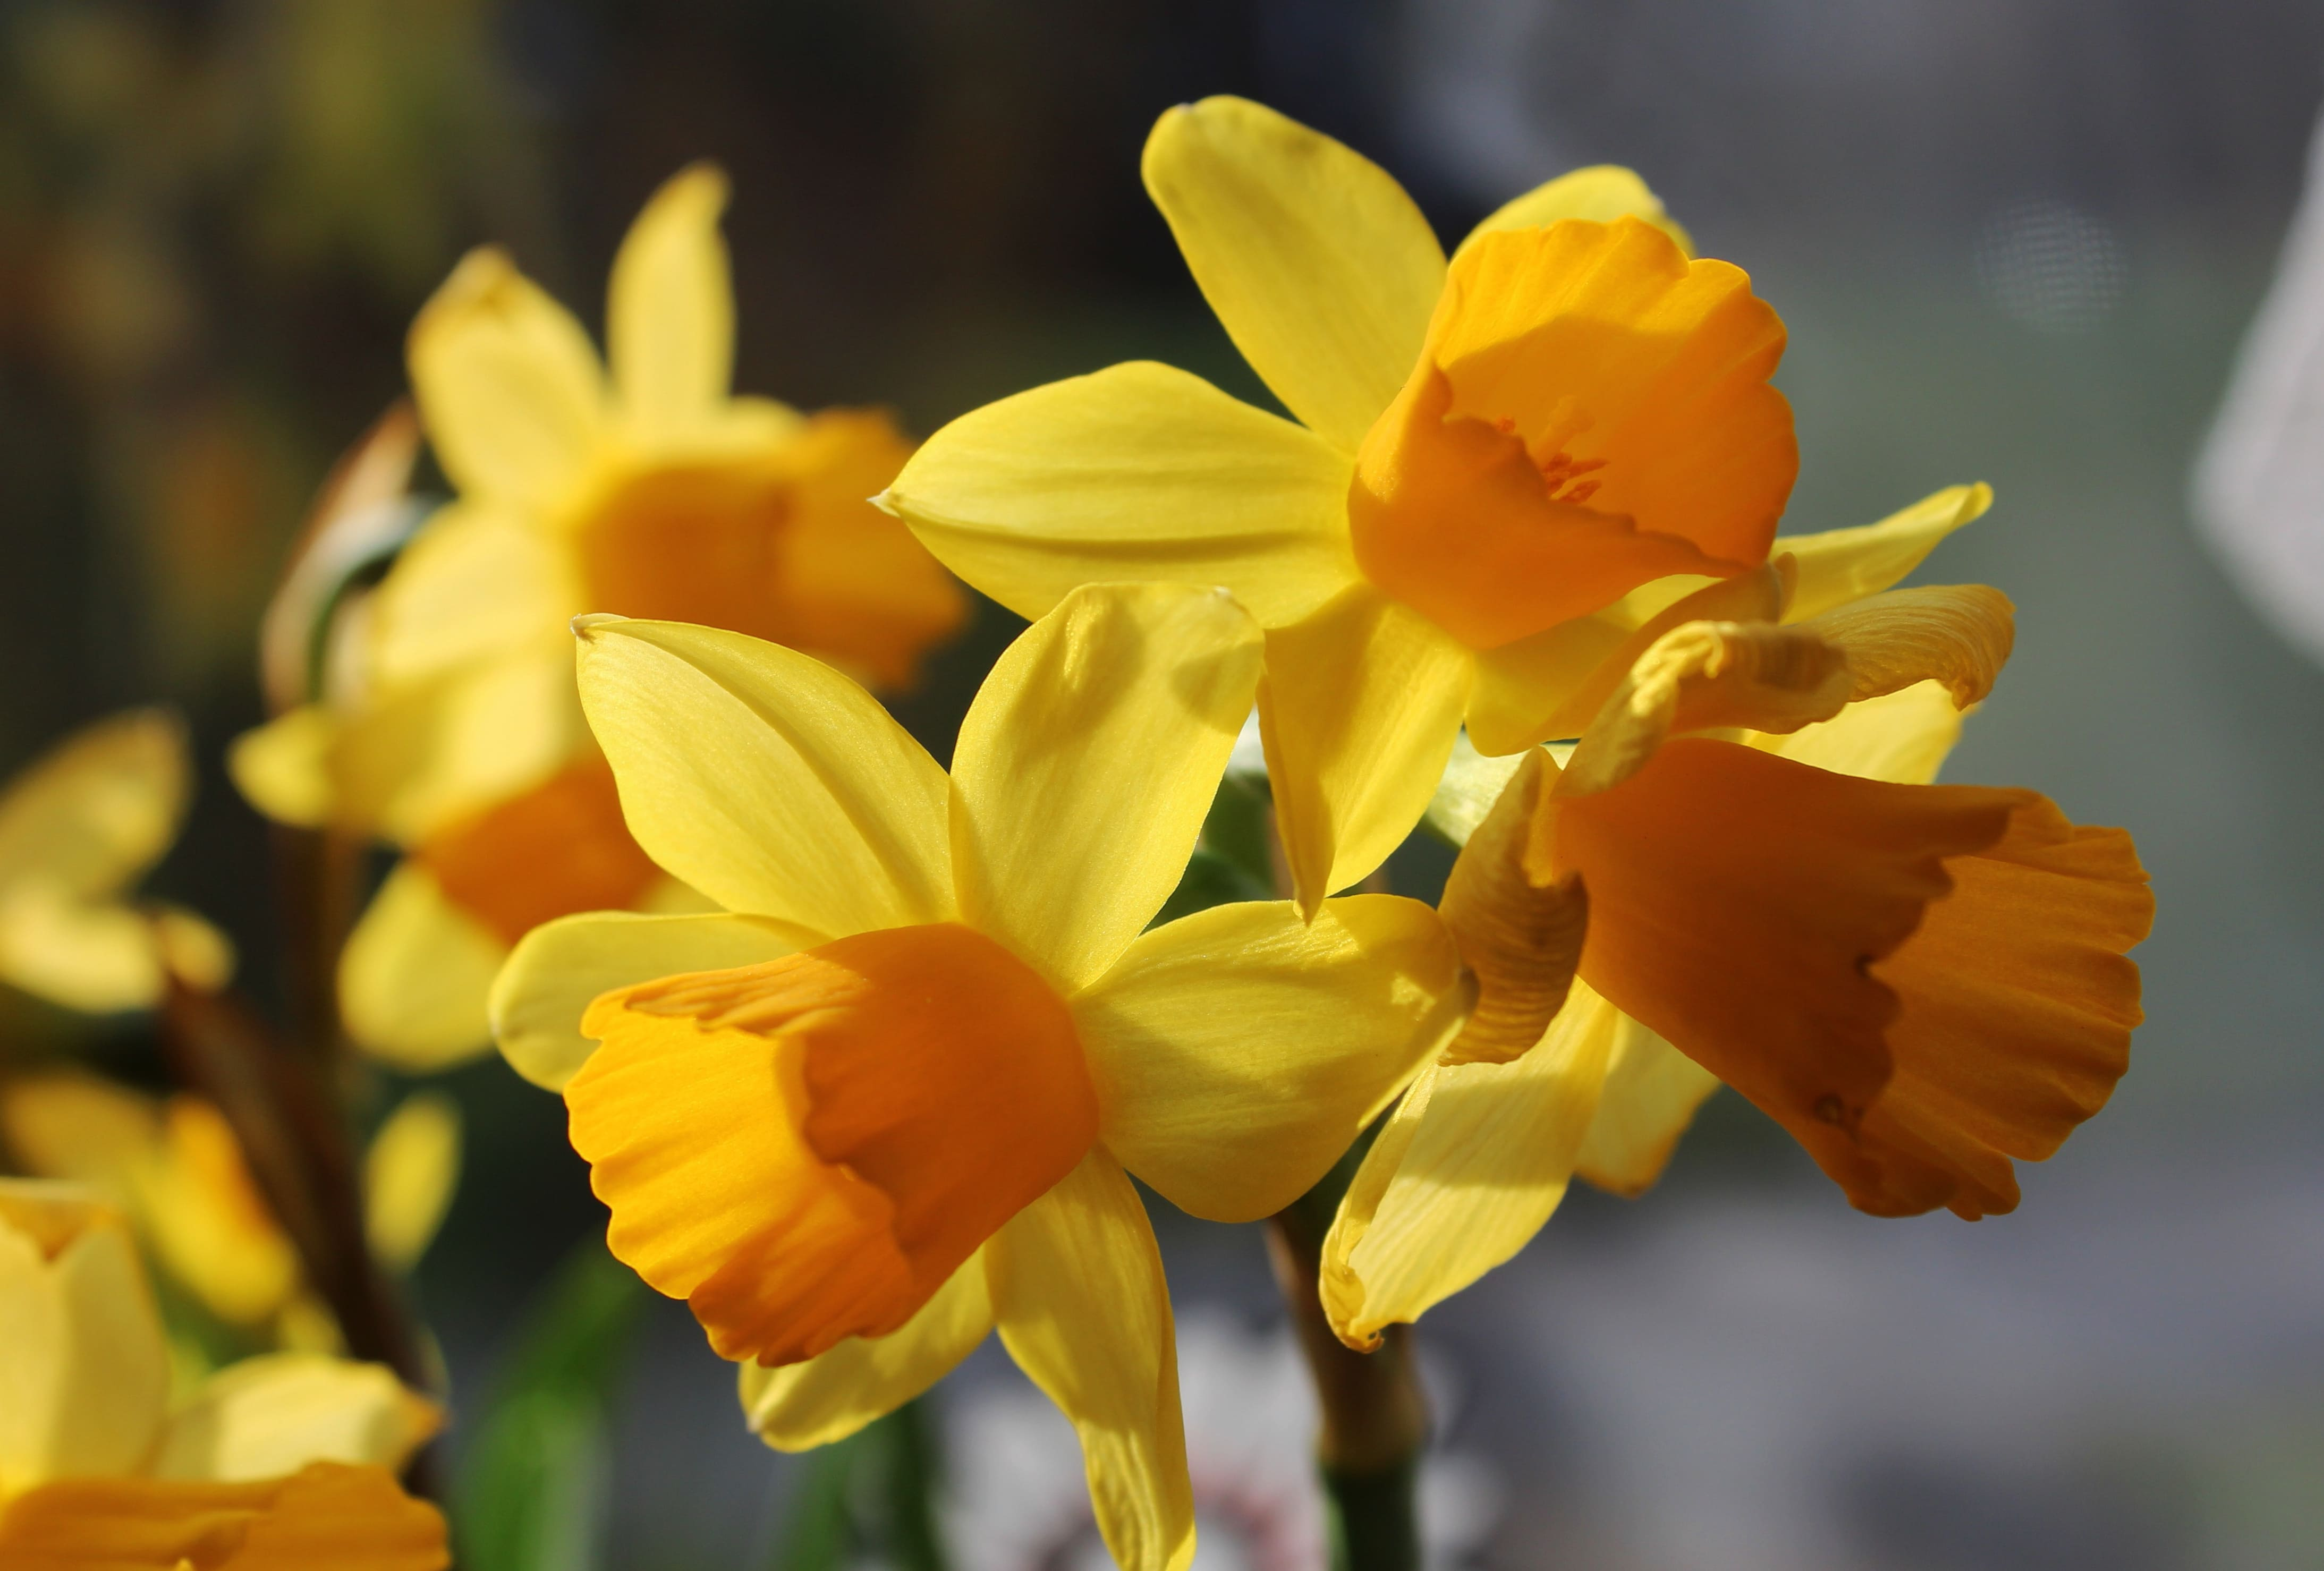 daffodils-photo-25